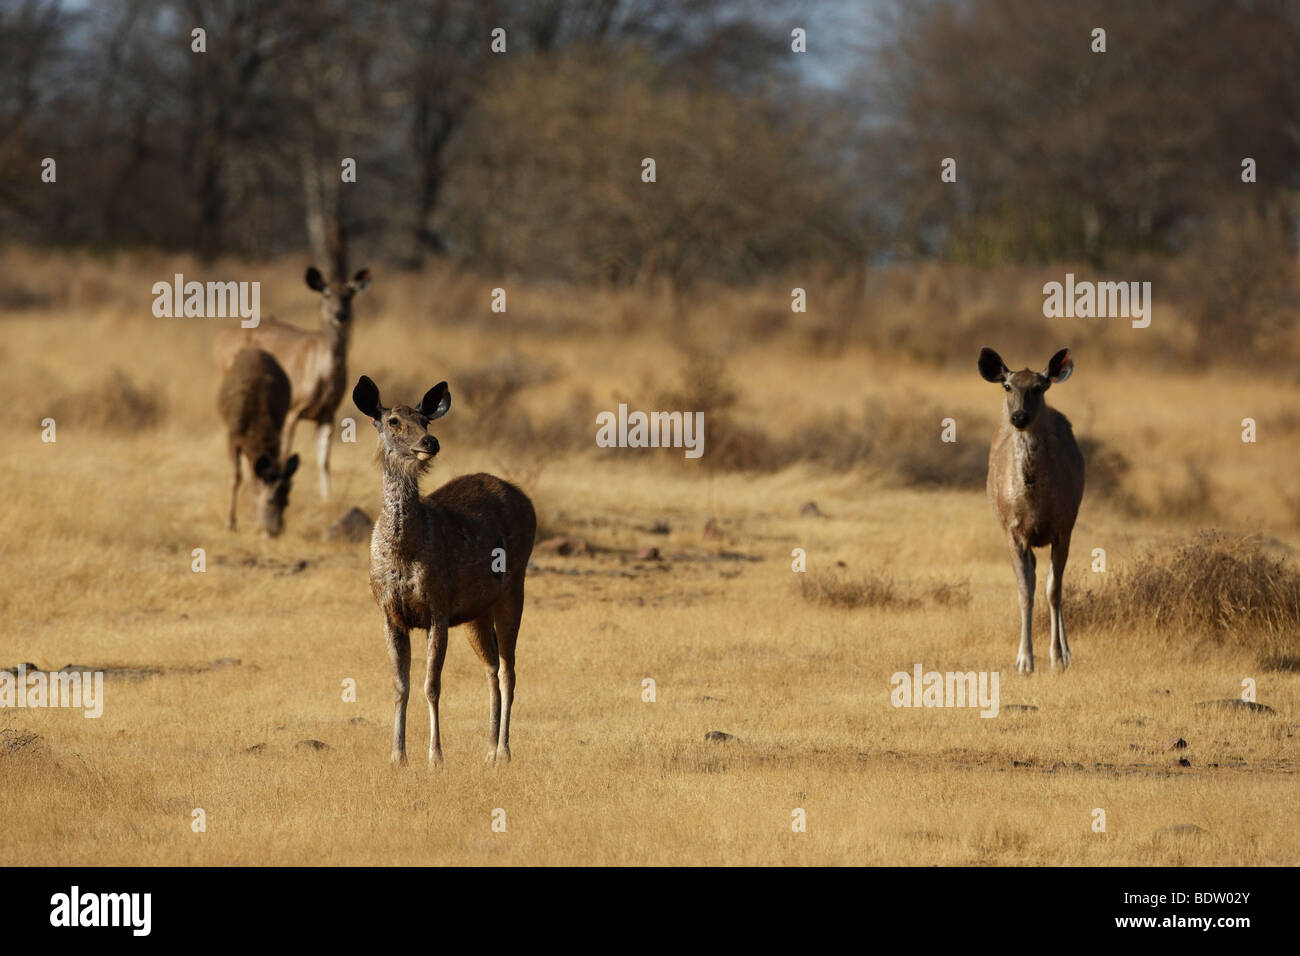 Sambarhirsch Im Khana Nationalpark, Indien, Sambar-Hirsch, Cervus unicolor, Khana Nationalpark, Indien Stockbild